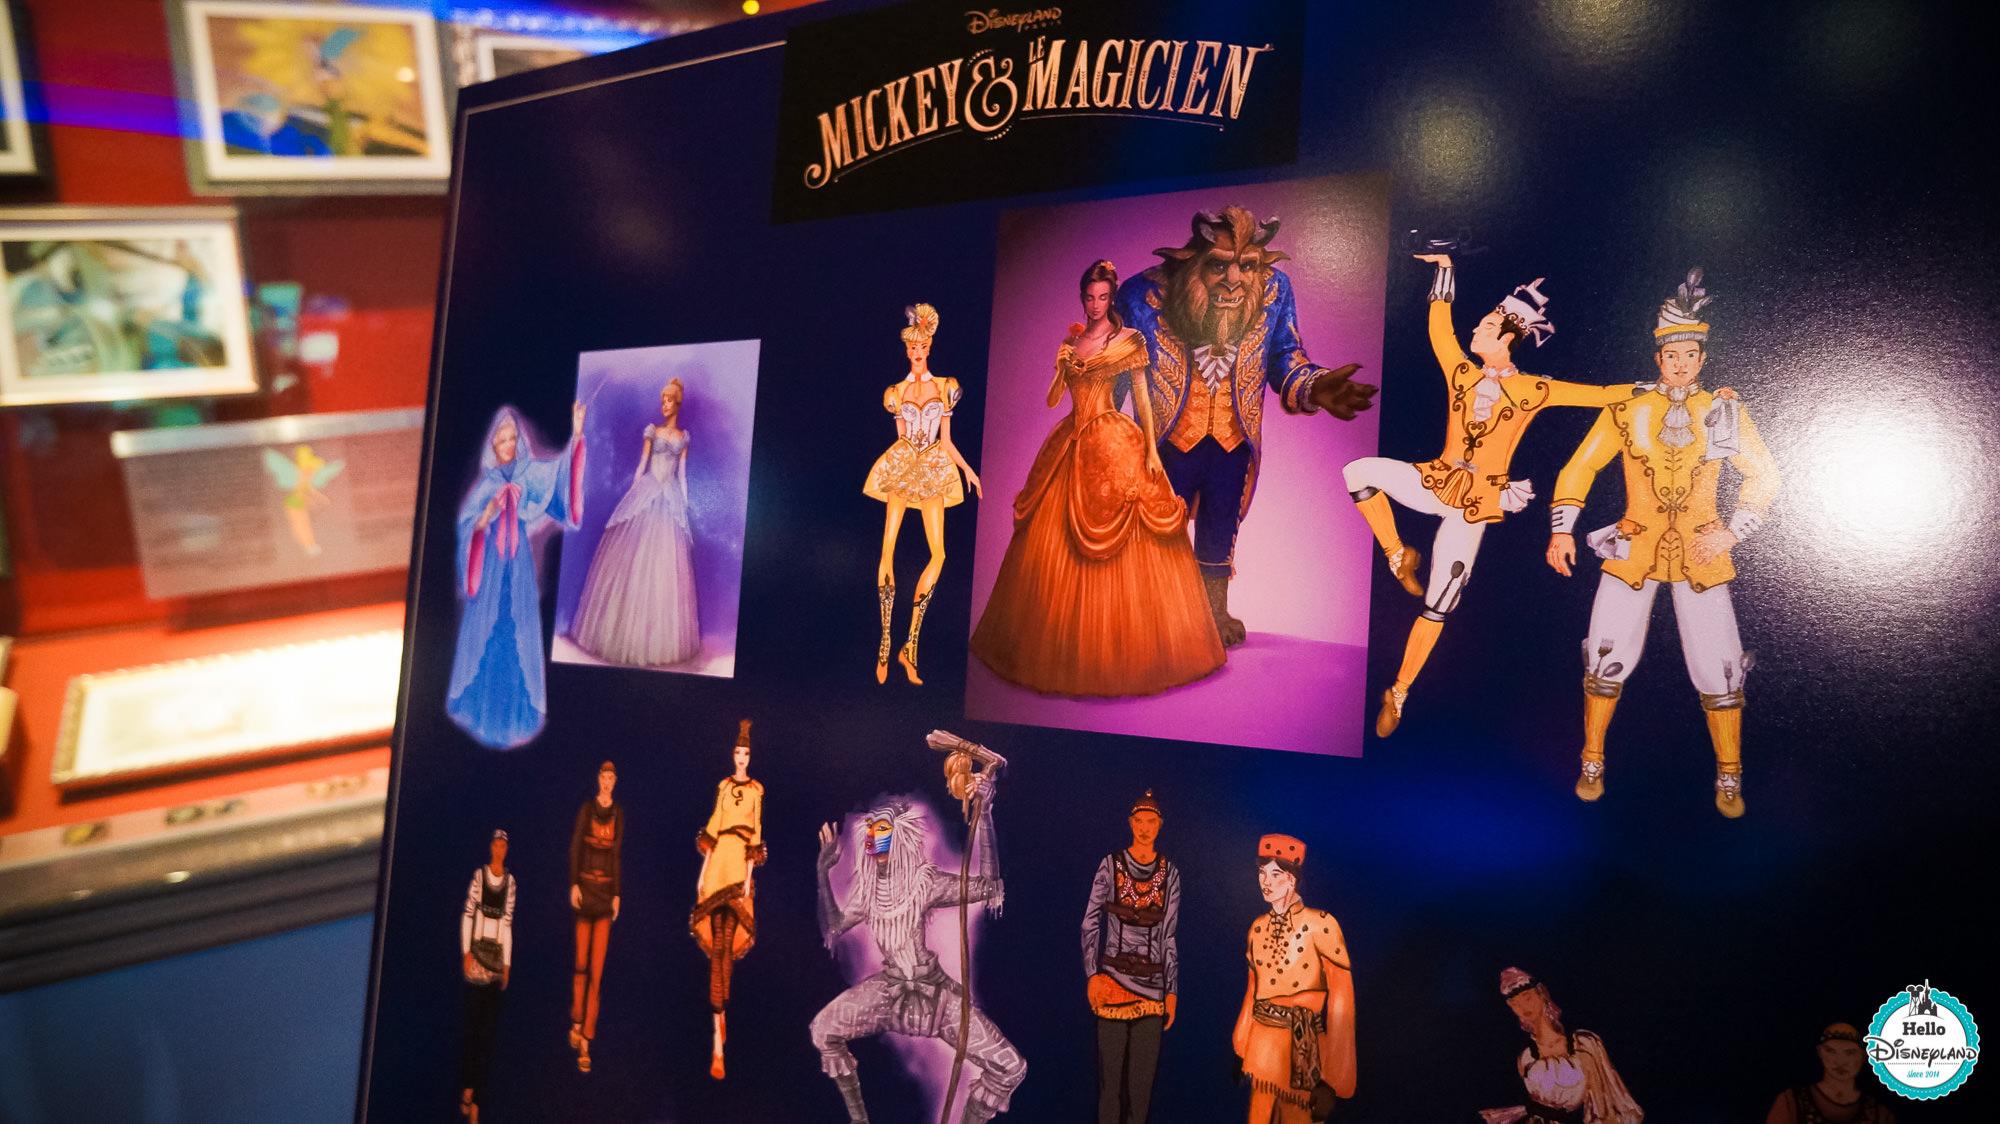 Micket et le Magicien - Disneyland Paris - Mickey and the Magician Press Event